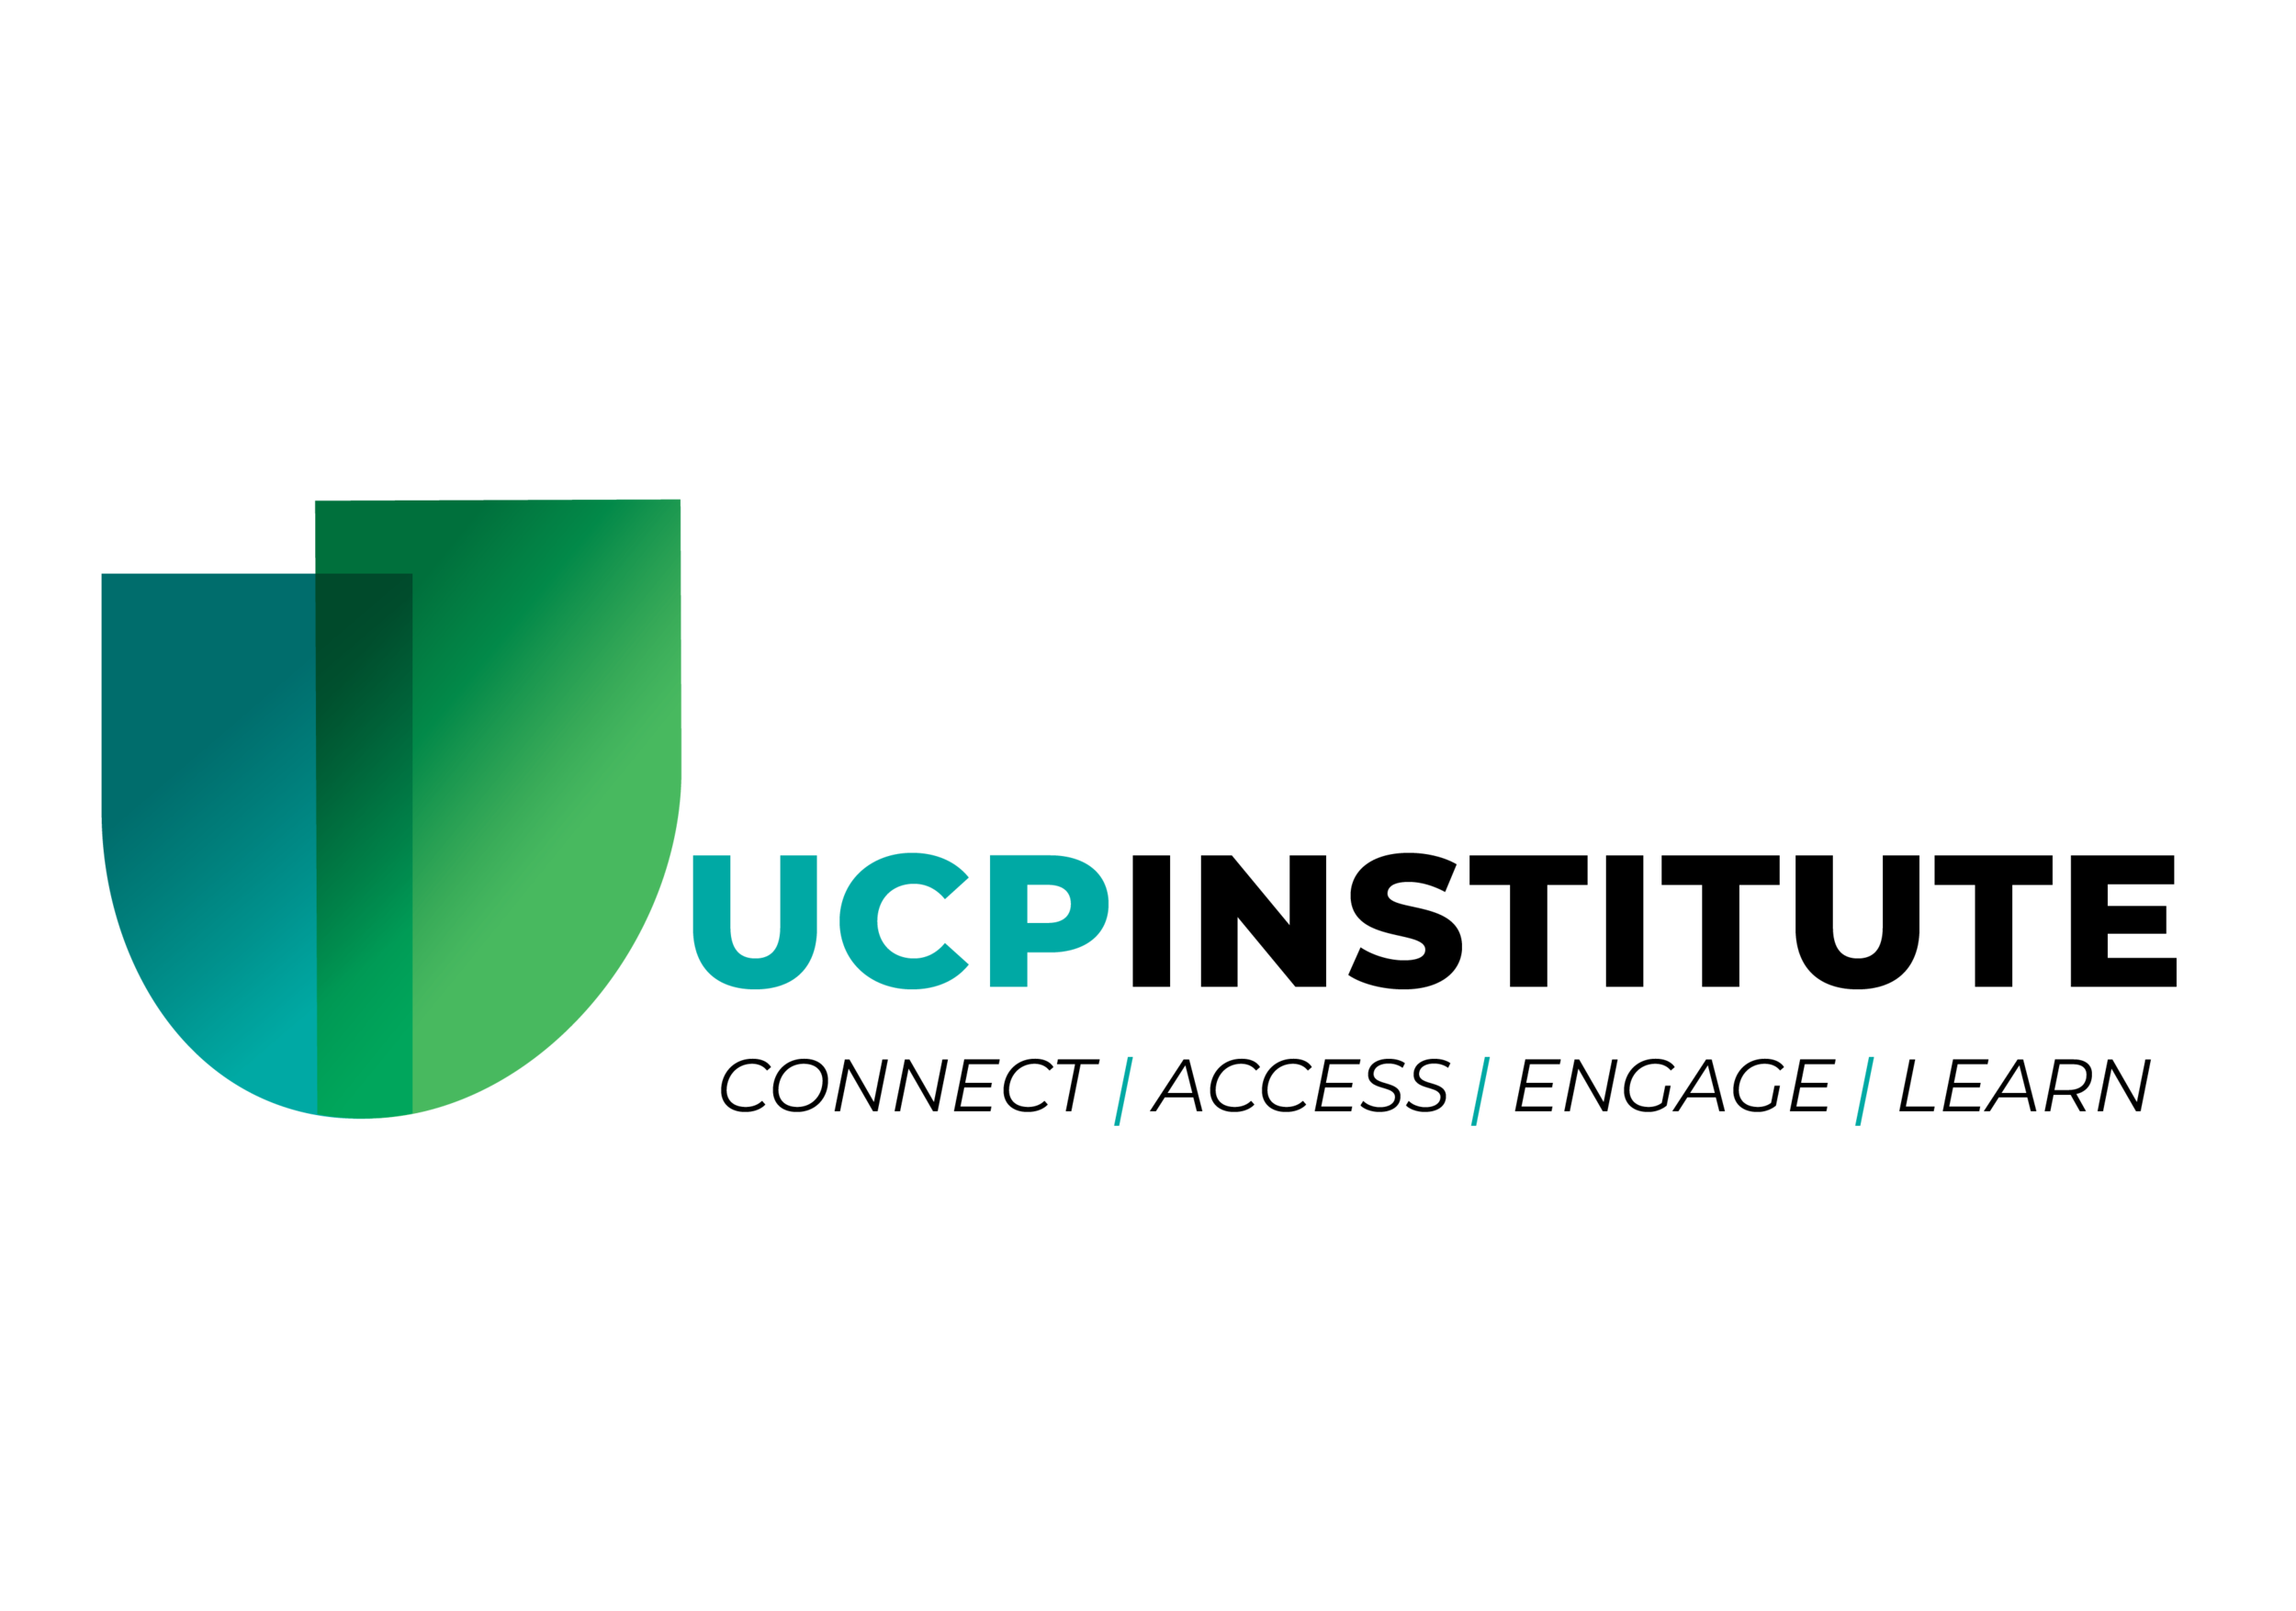 UCP-Institute-logo-2019_full-color-02.png